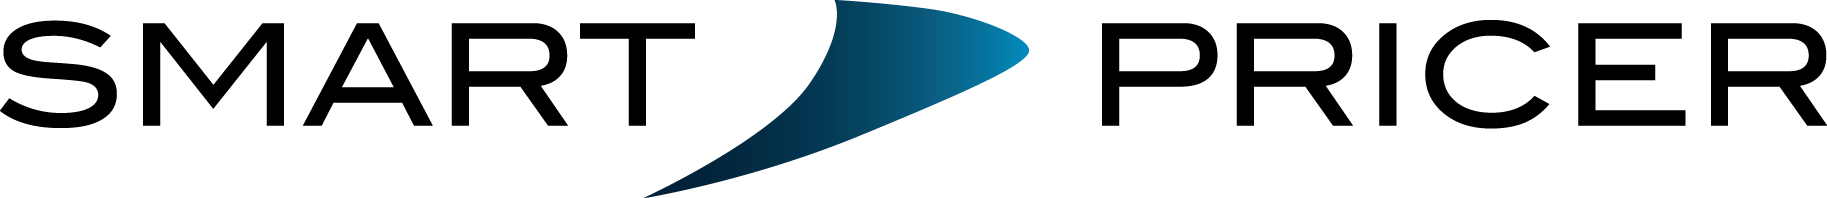 smartpricer Logo